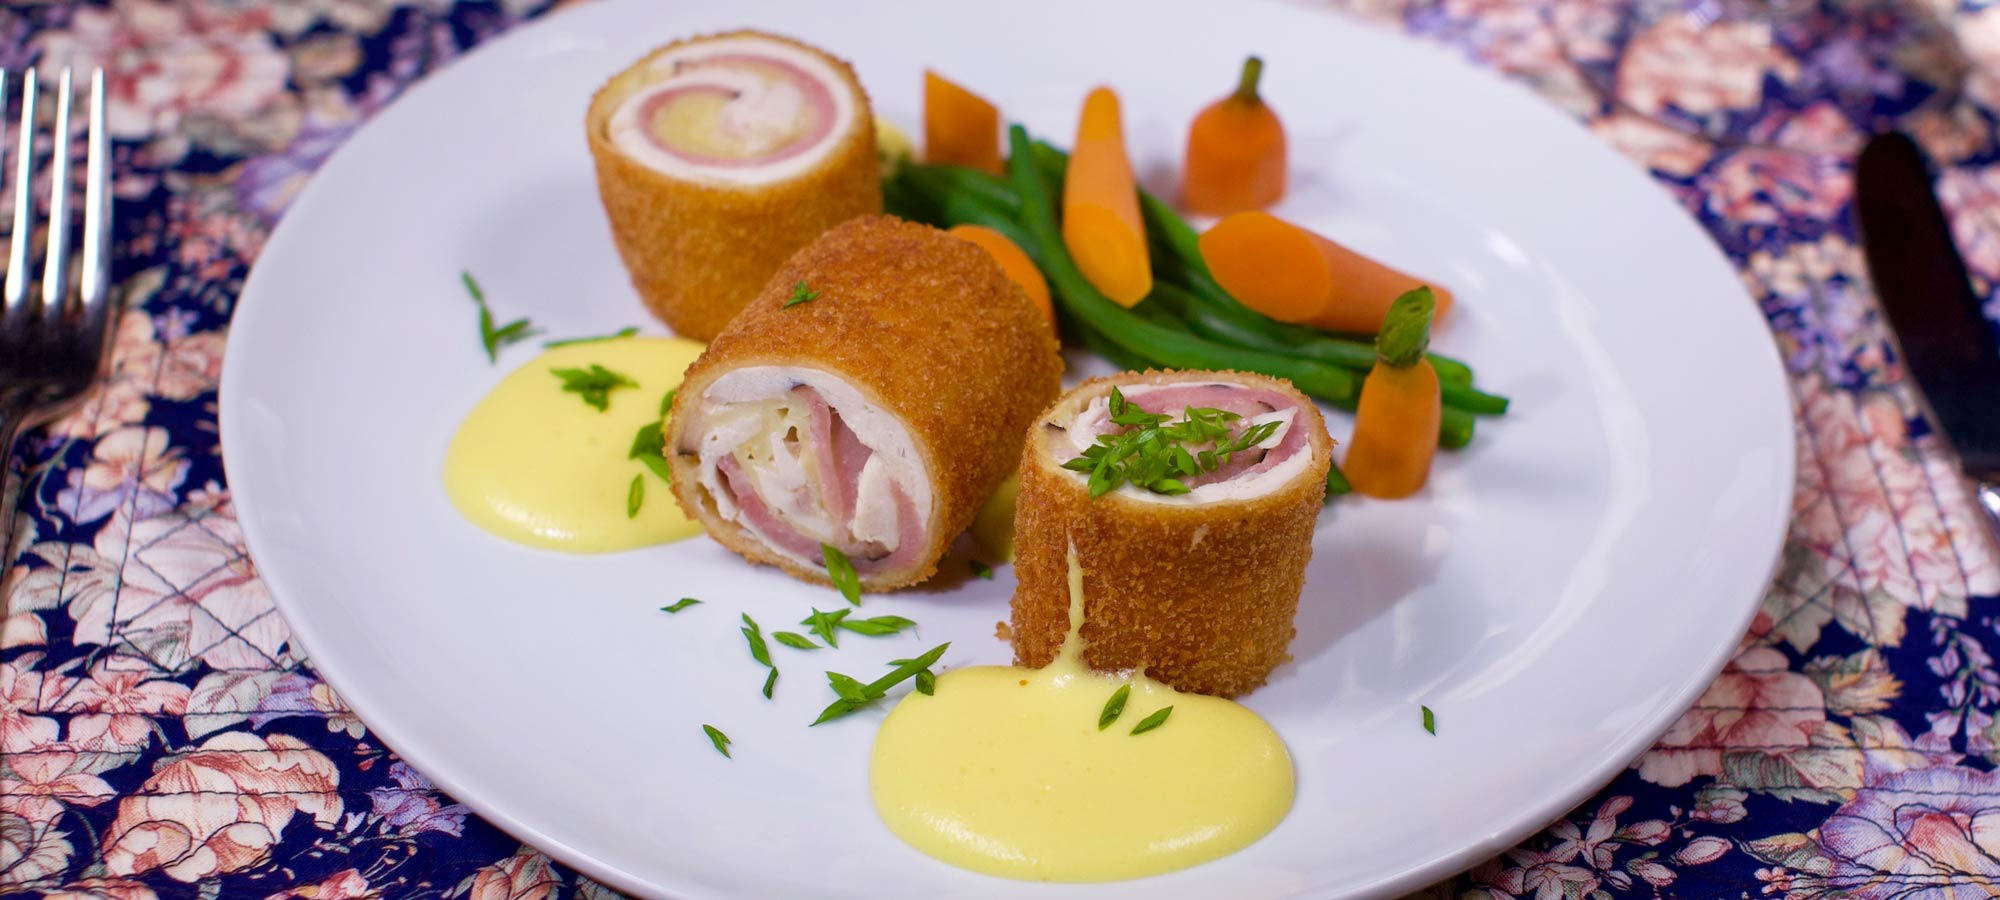 Chicken Cordon Bleu at countryman's Pleasure Restaurant in Rutland, VT